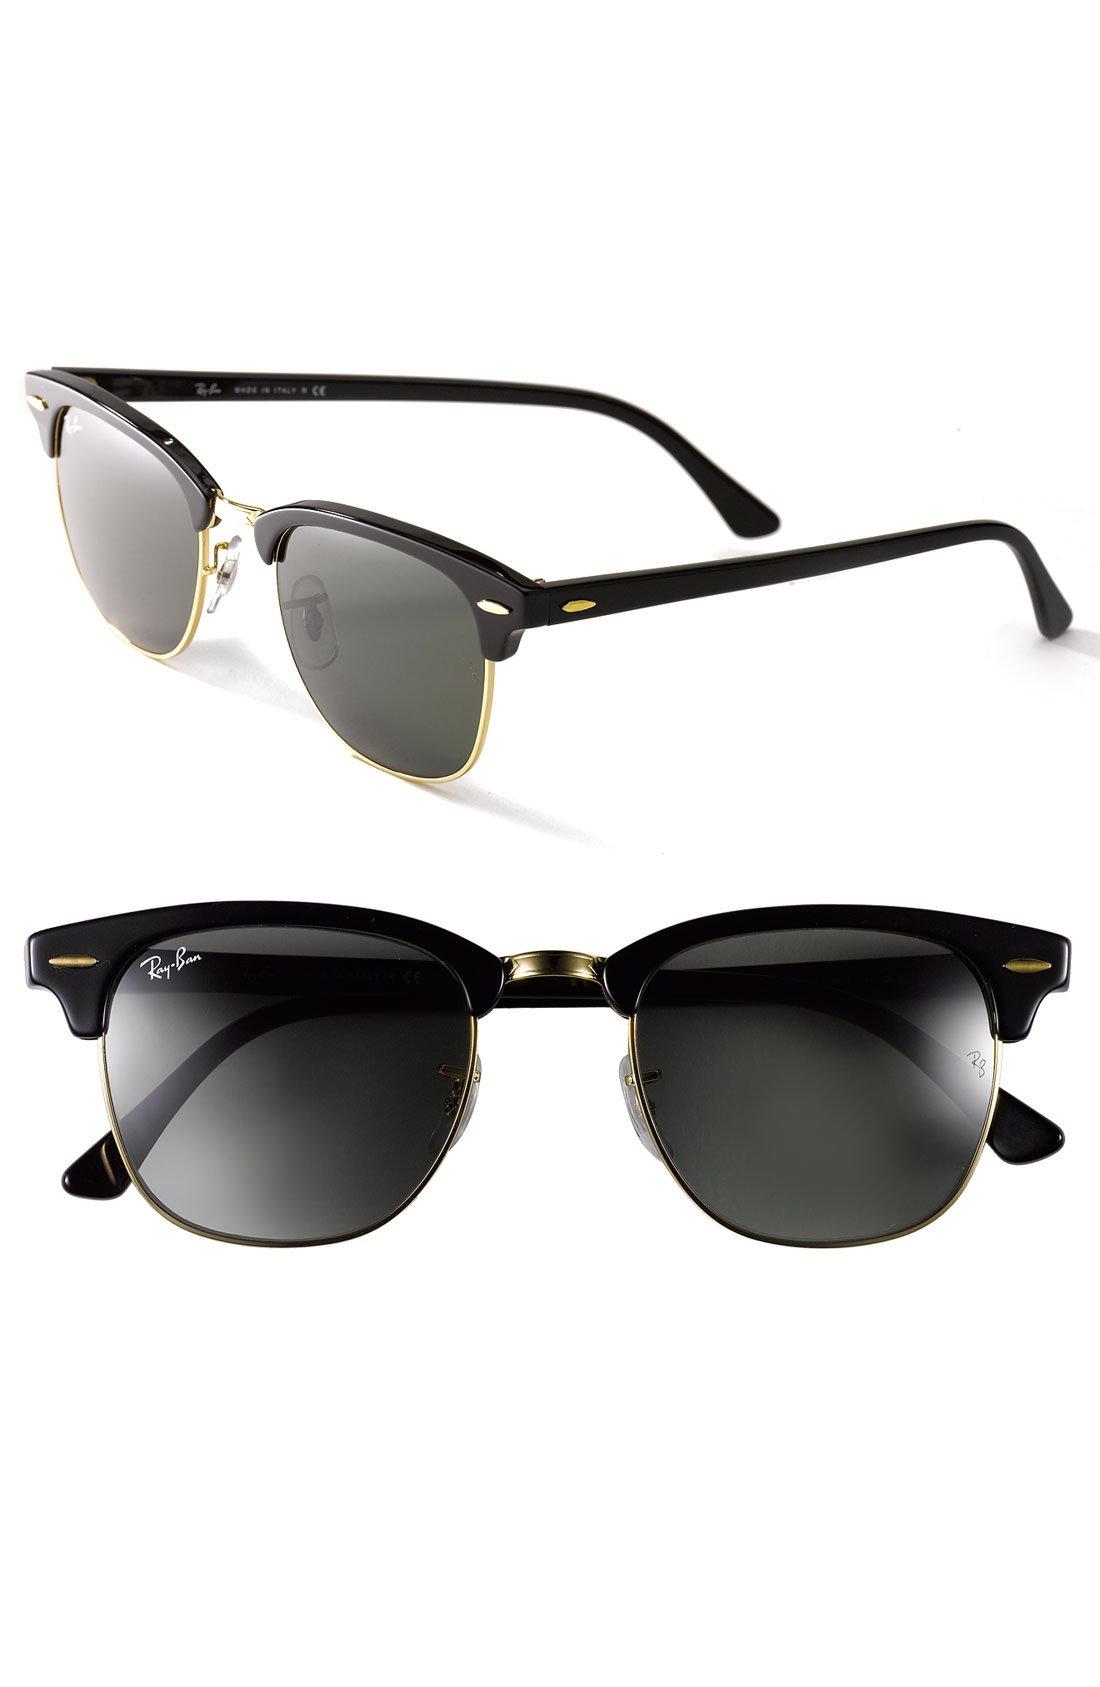 ray ban checkered colorful sunglasses cinemas 93. Black Bedroom Furniture Sets. Home Design Ideas